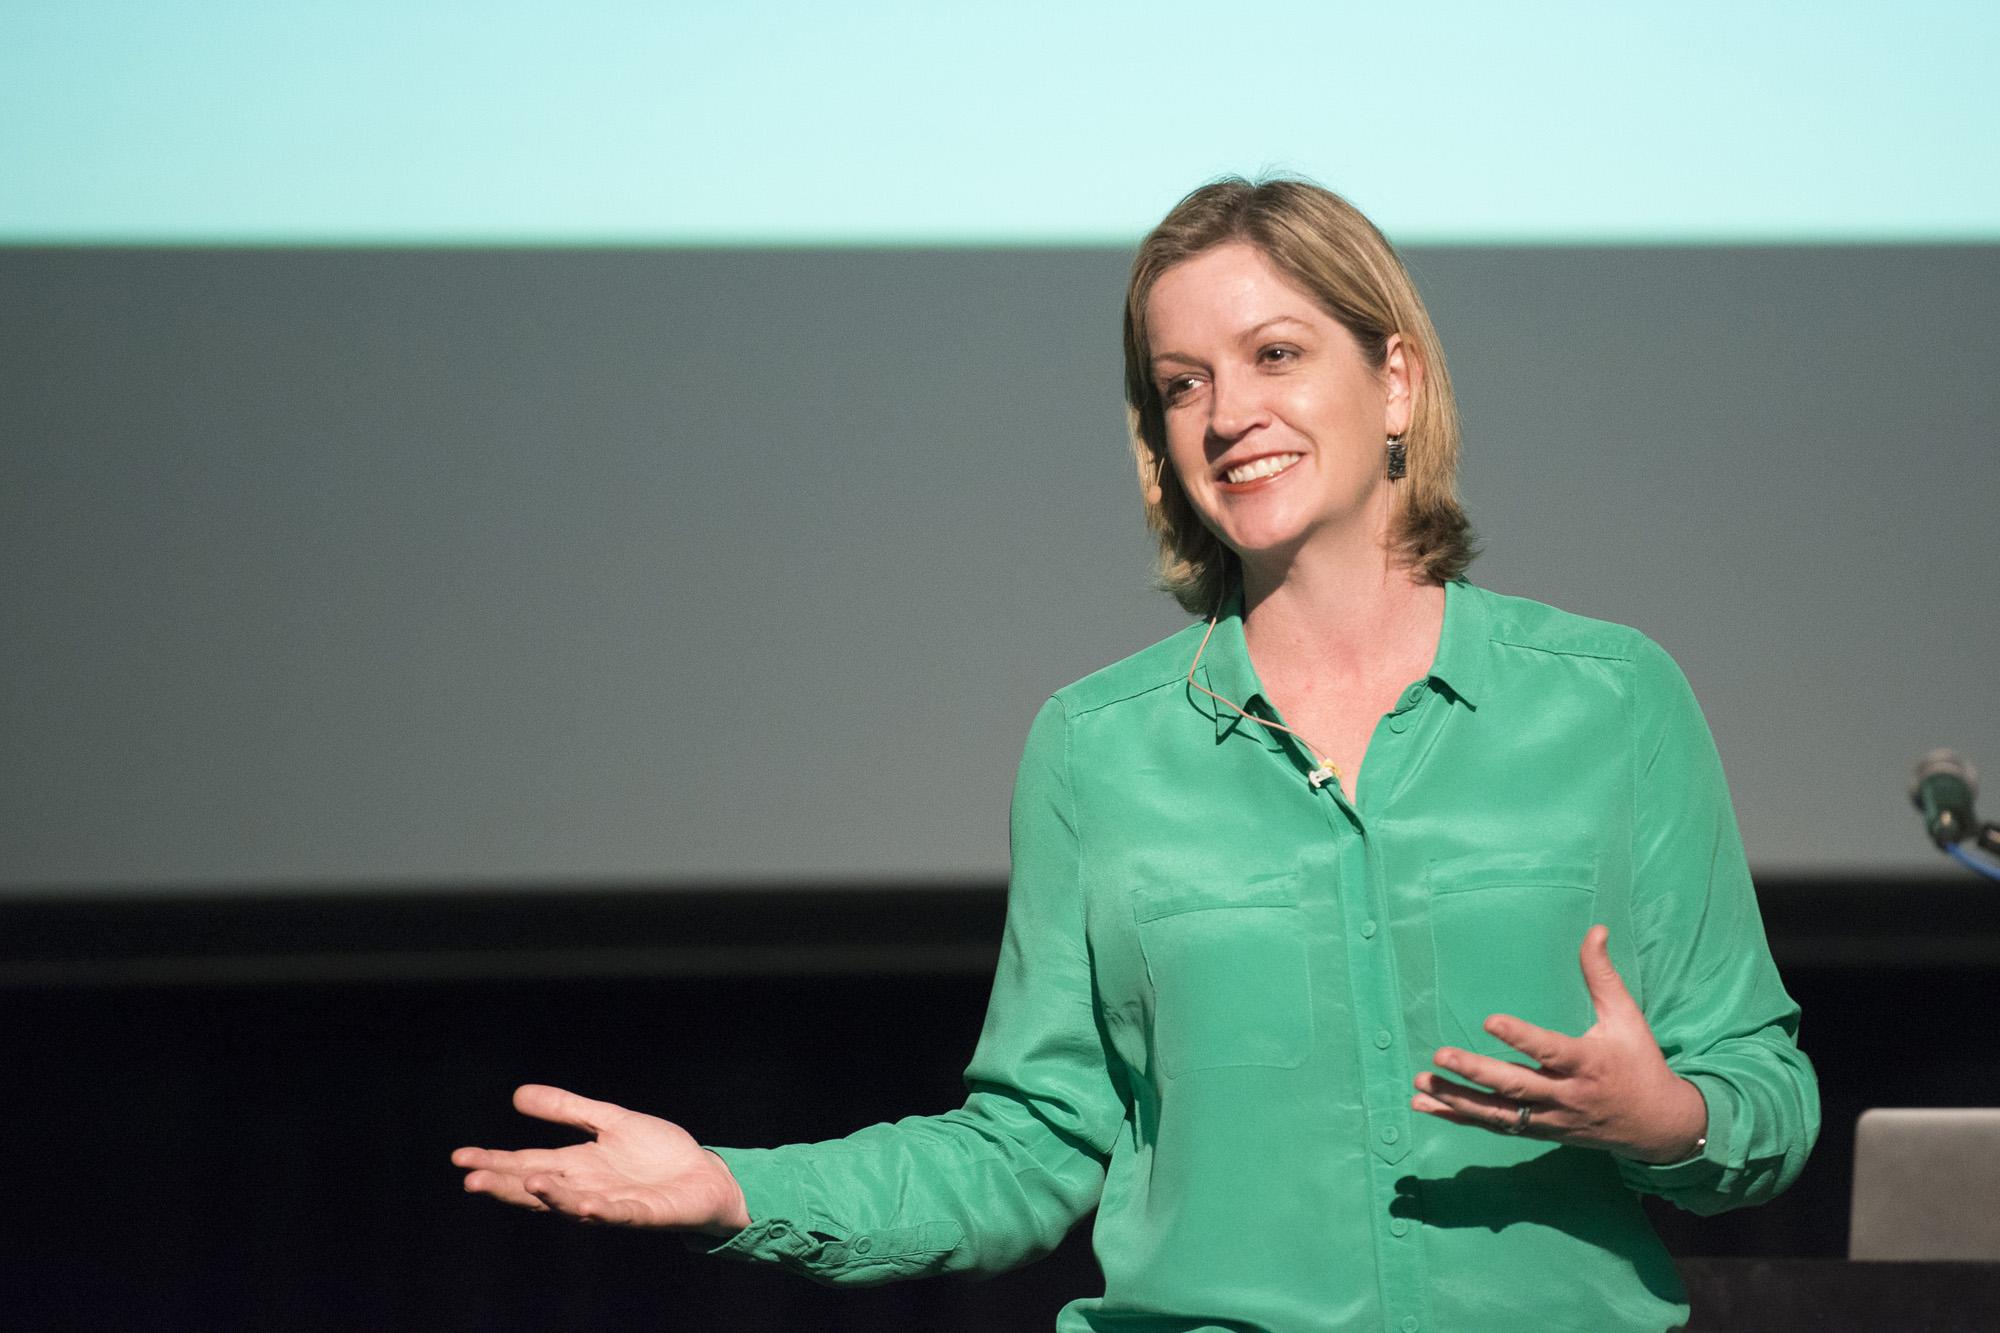 Leadership & Teamwork Speaker, Author & Expert